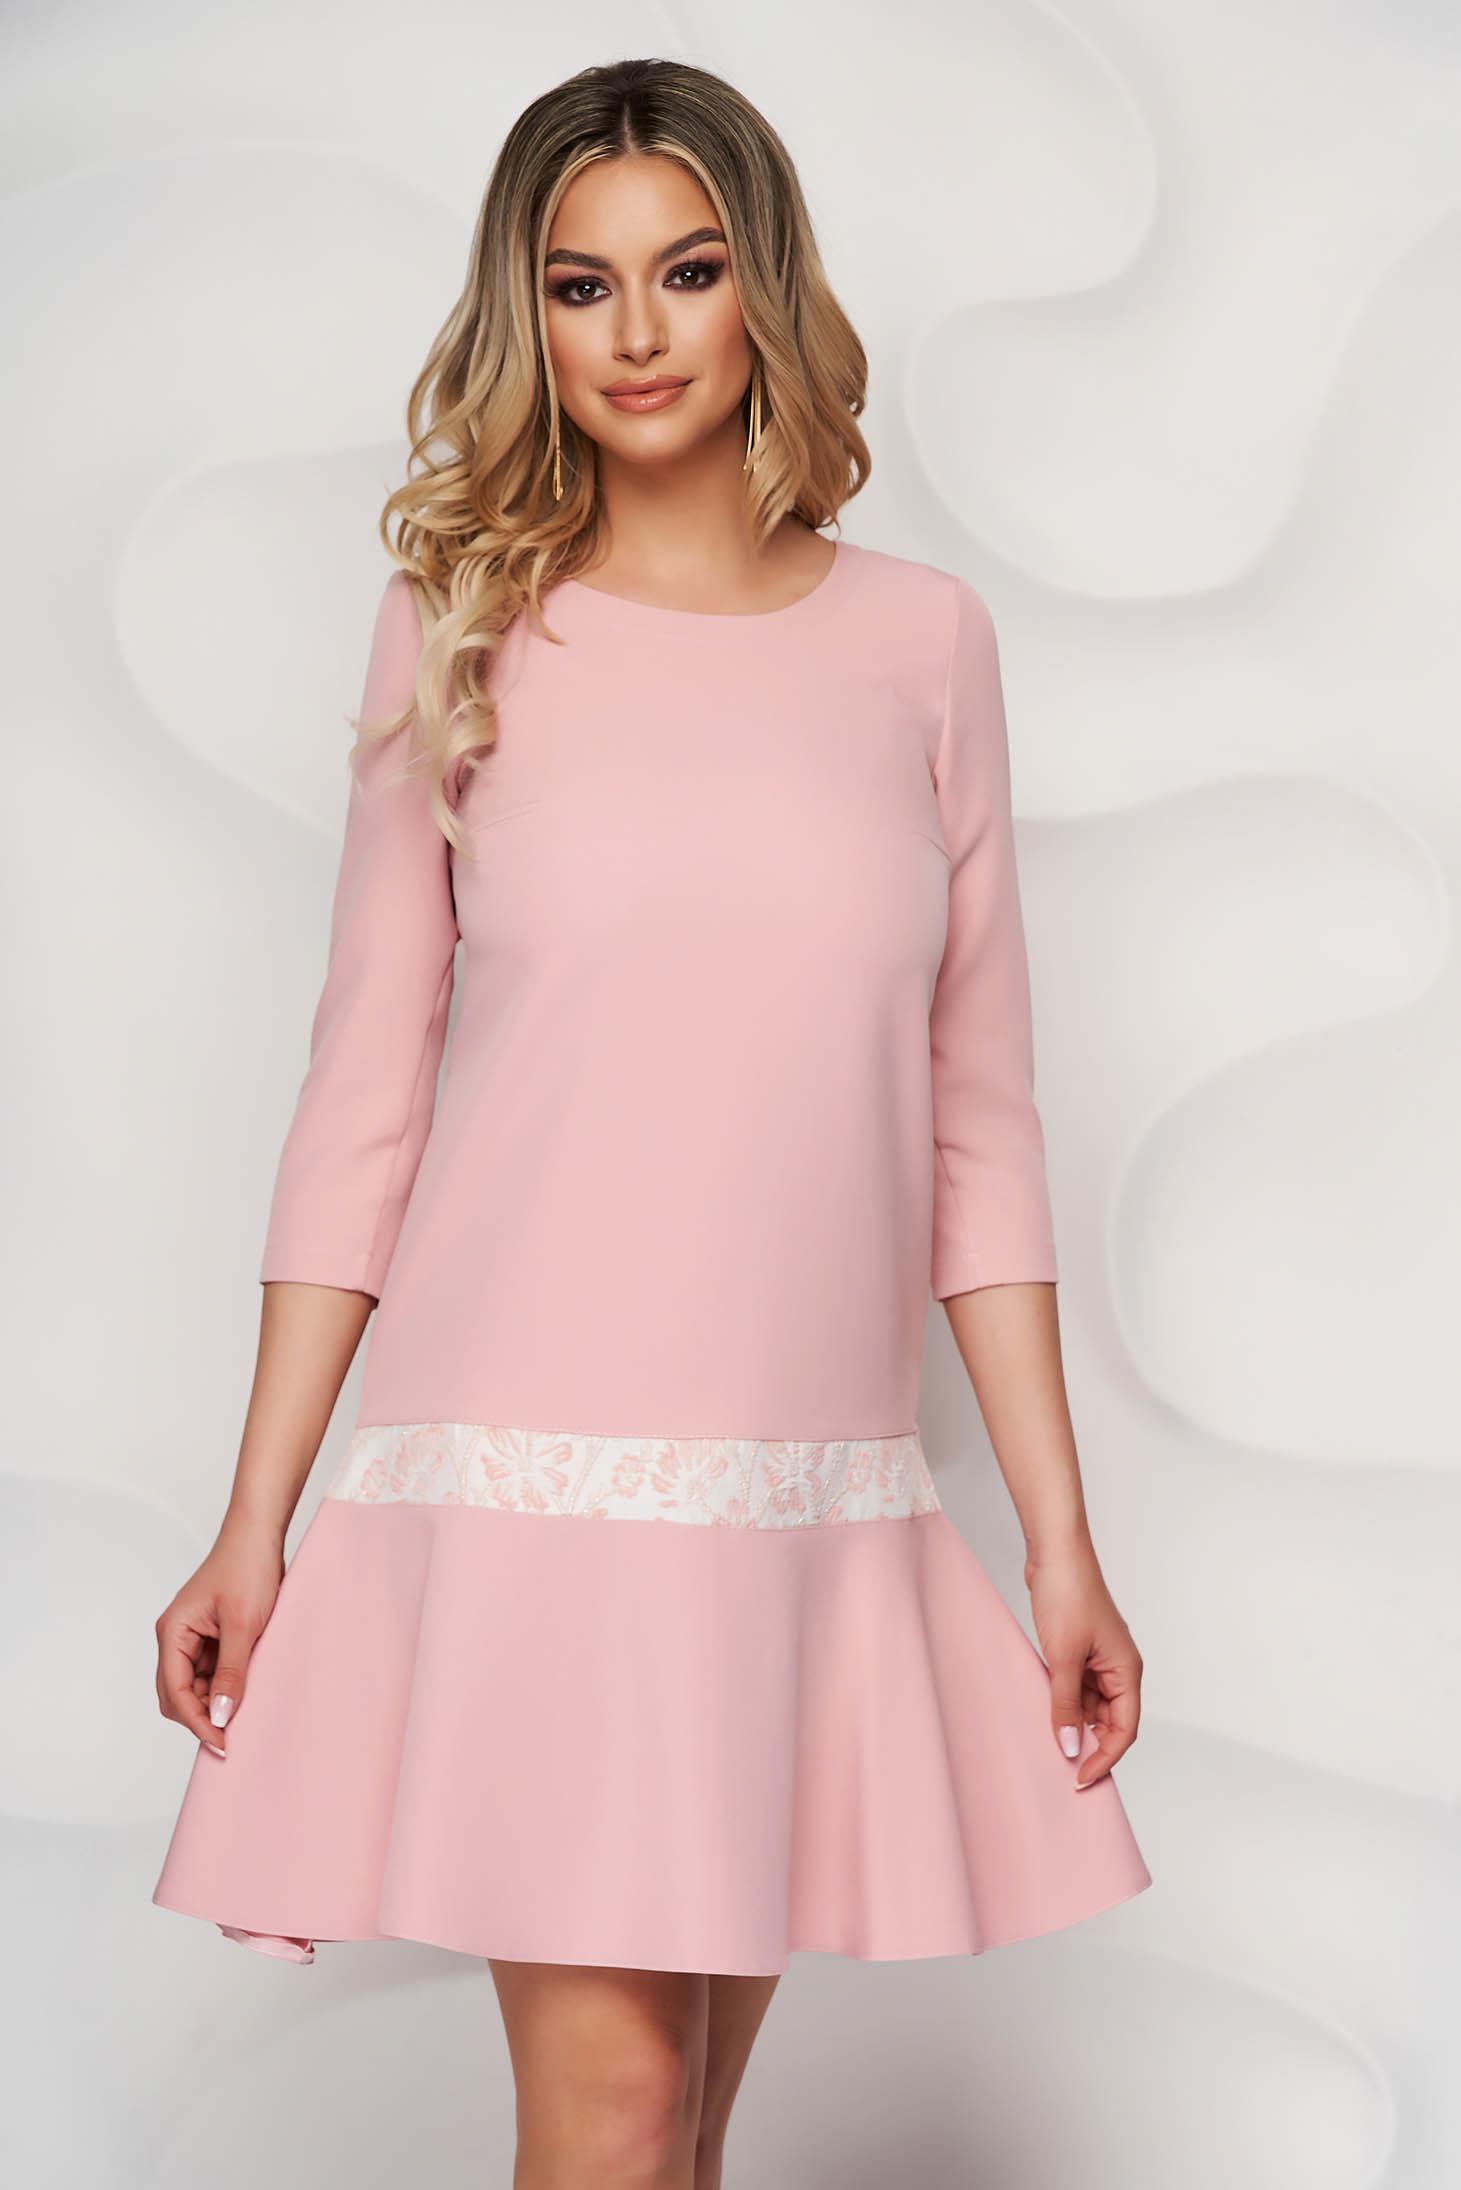 Púder rózsaszínű A-vonalú StarShinerS ruha